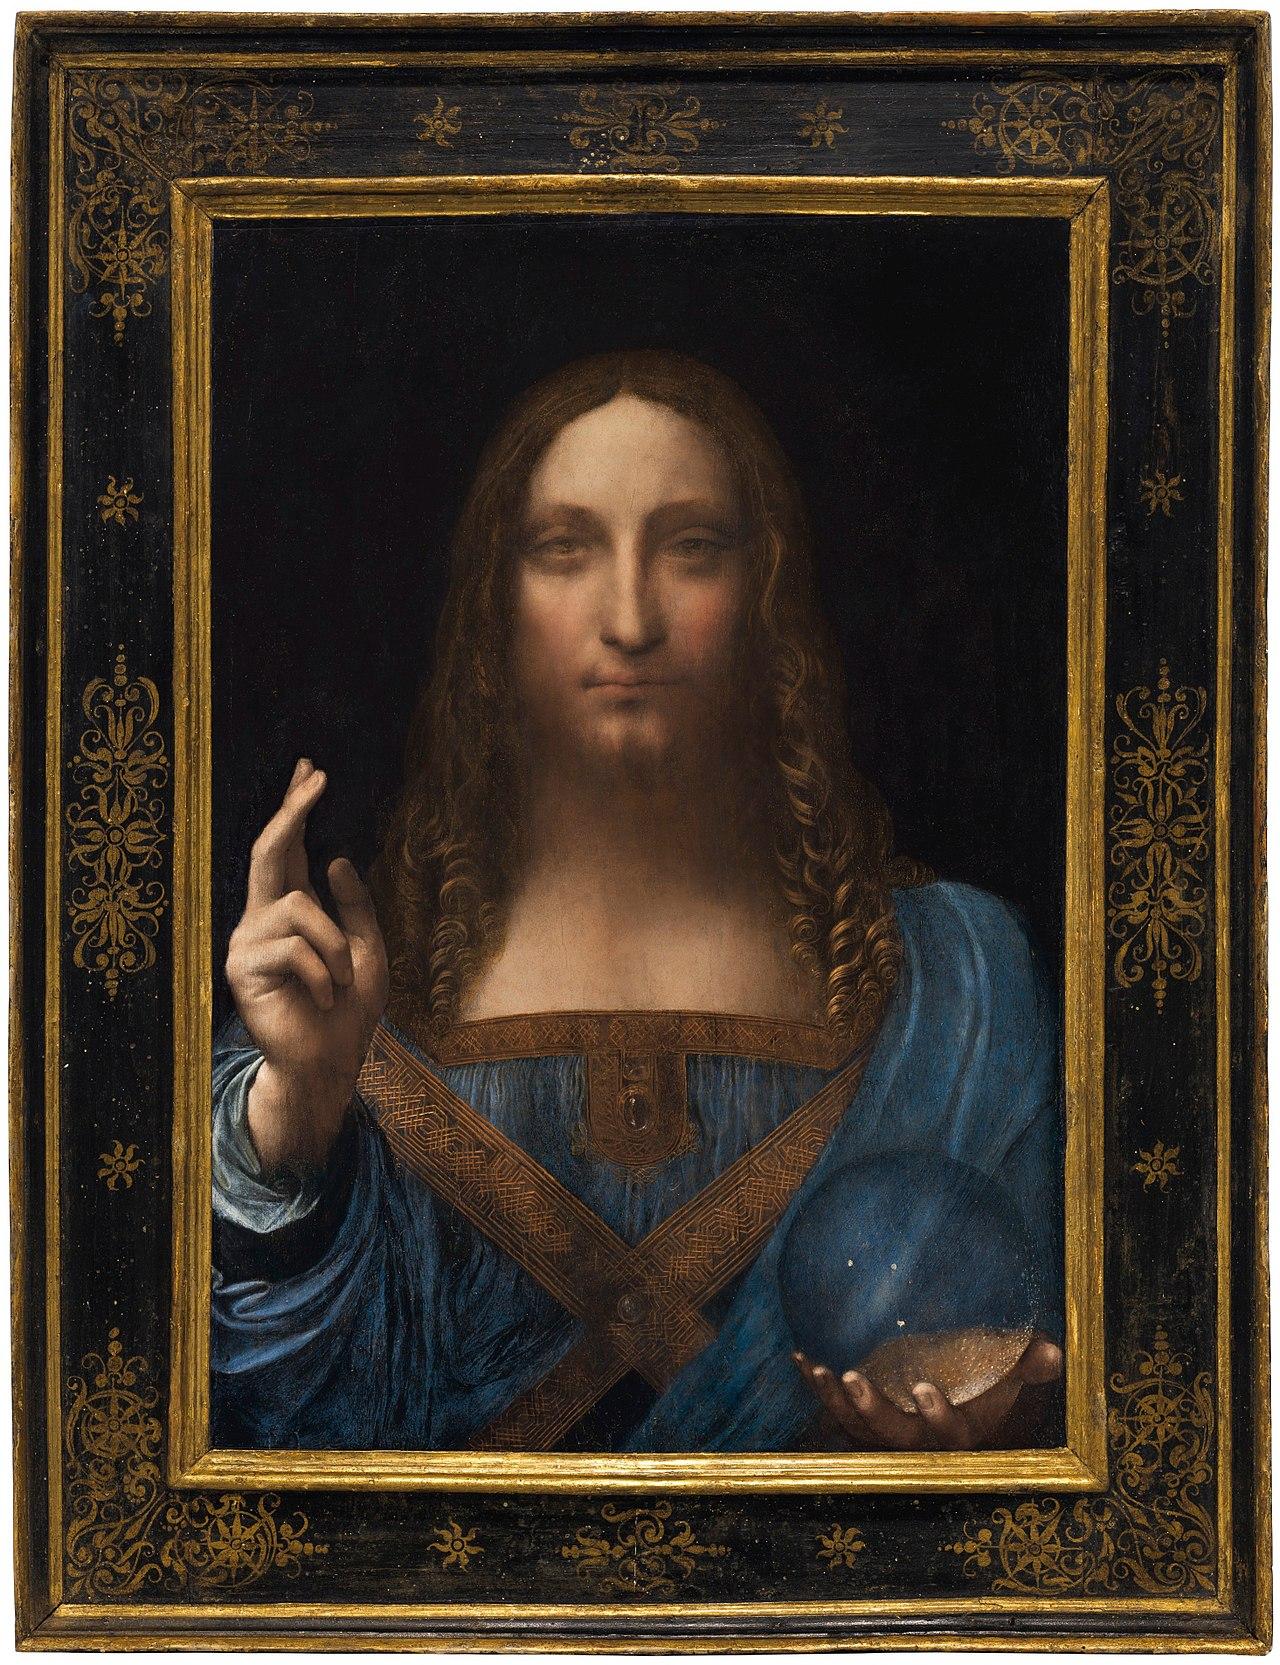 38. Salvàtor mundi - attribuito a Leonardo da Vinci (c. 1499) – coll. privata, Abu Dhabi